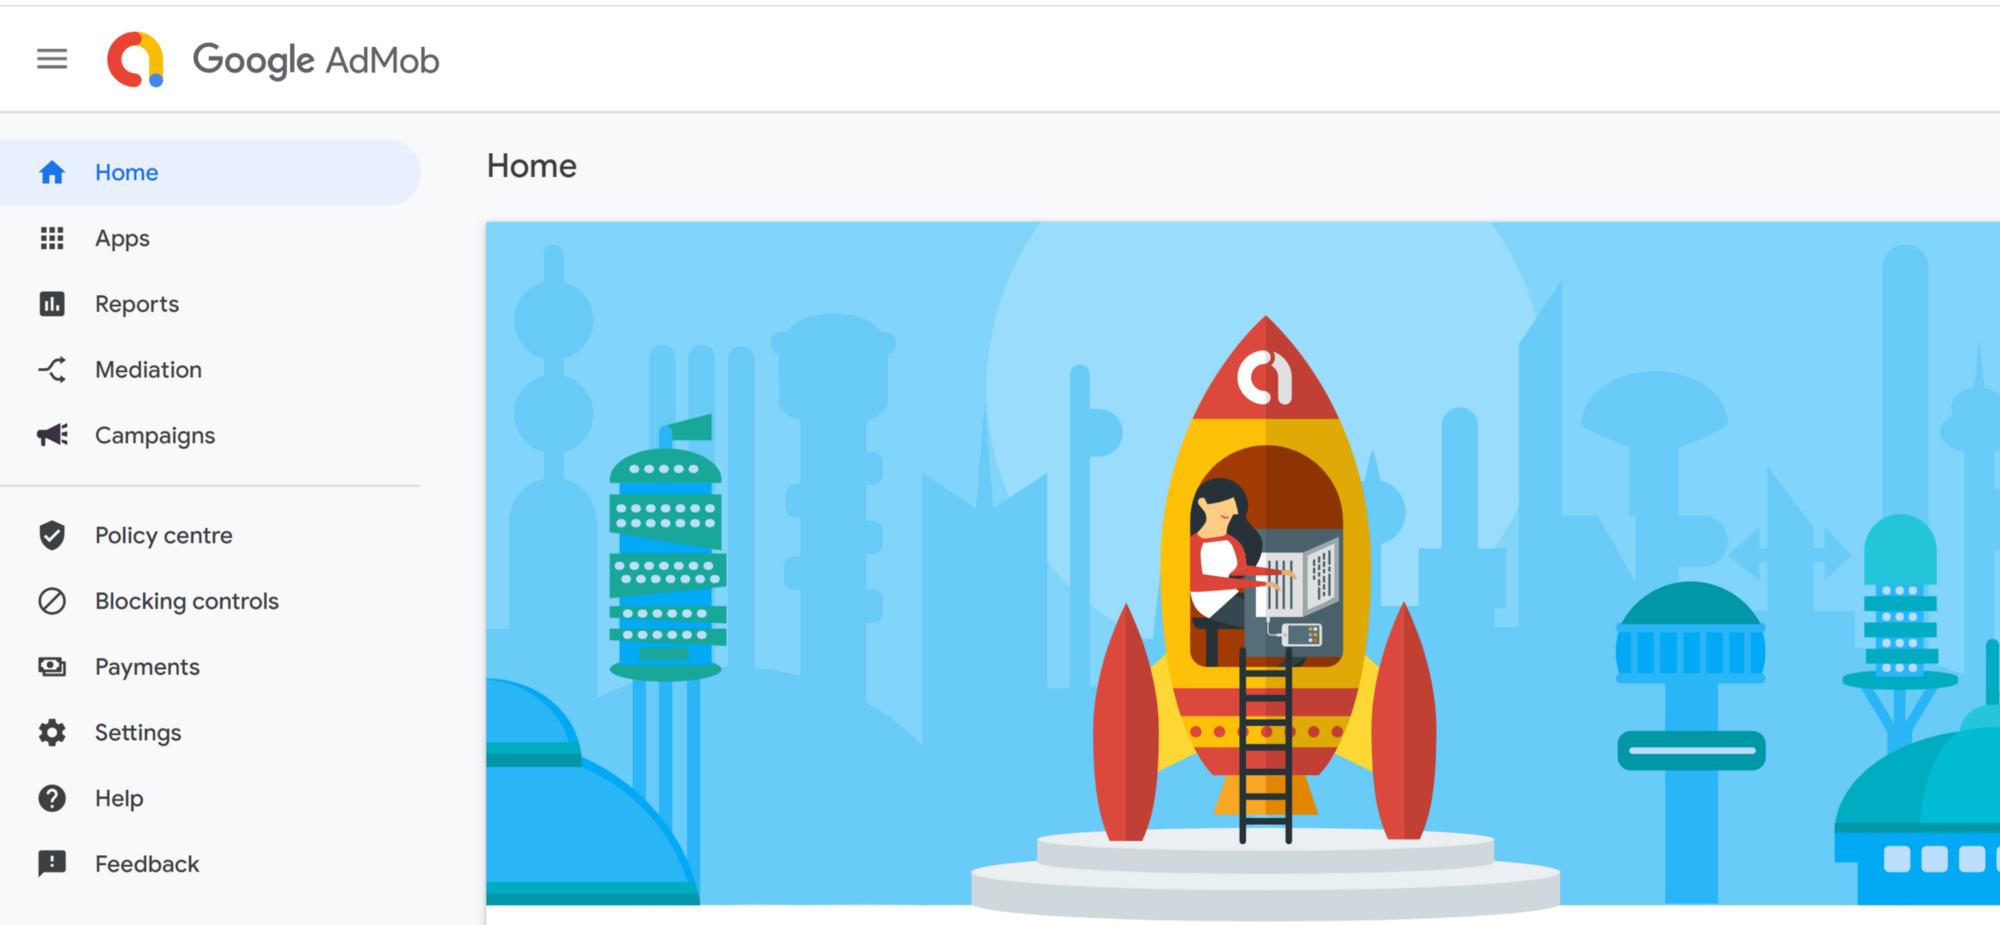 GoogleAdMob